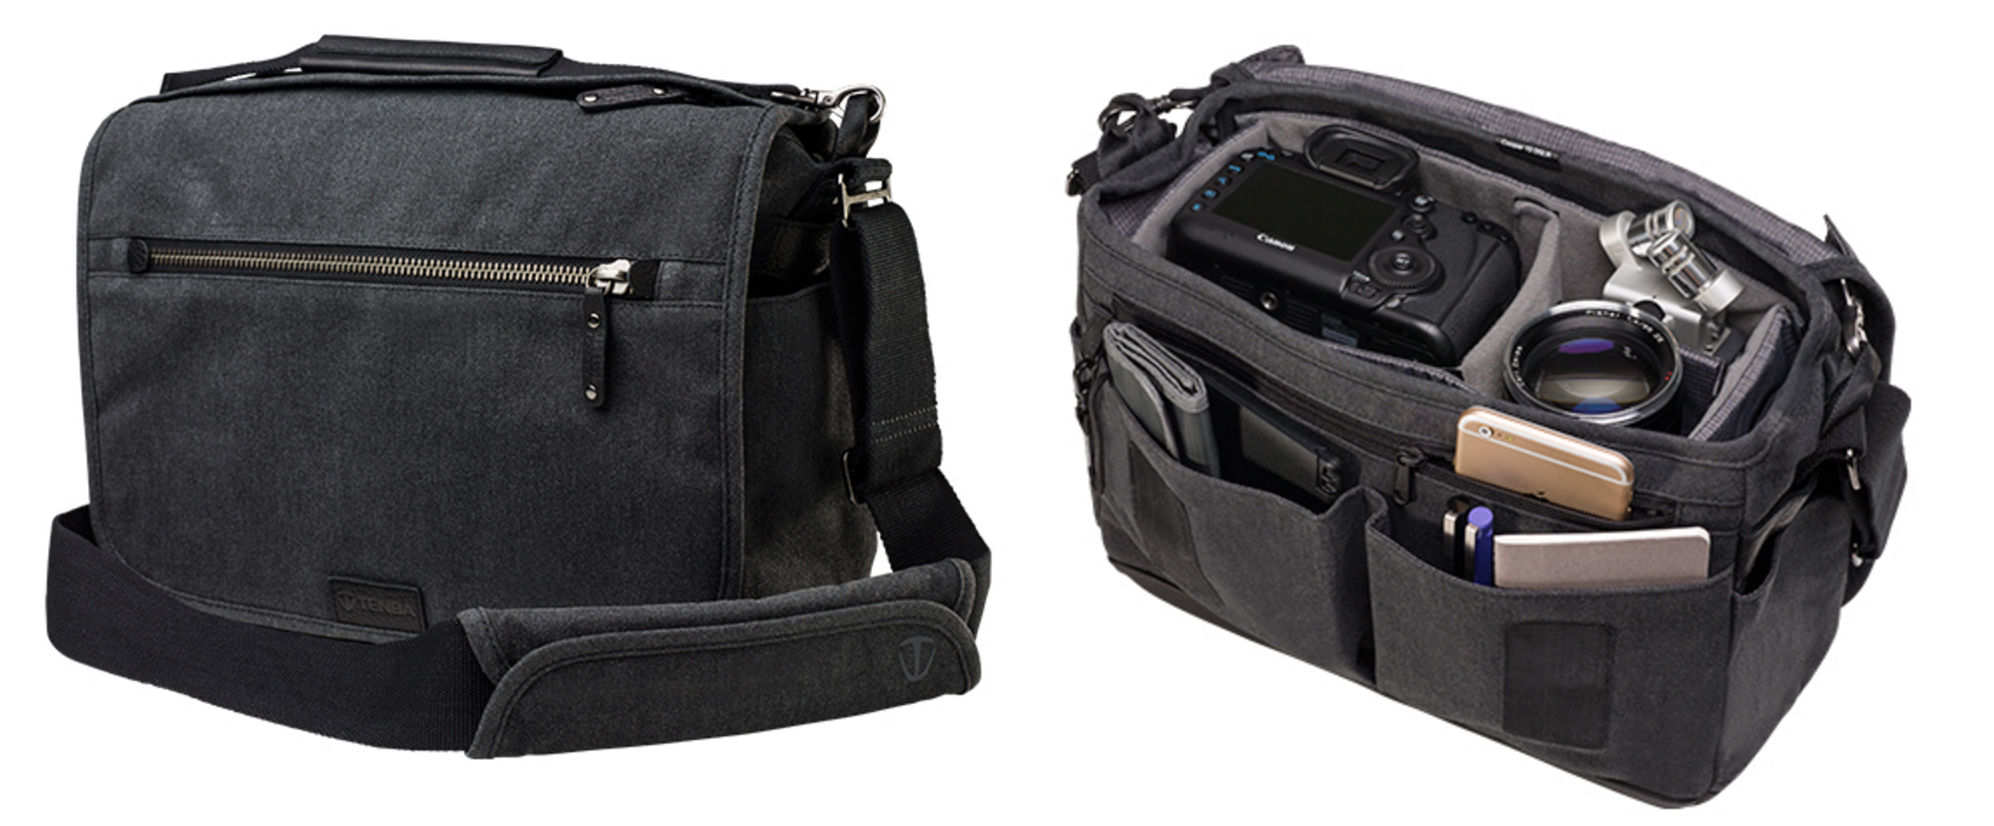 Top 5 Camera Bags That Don't Look Like Camera Bags | cinema5D